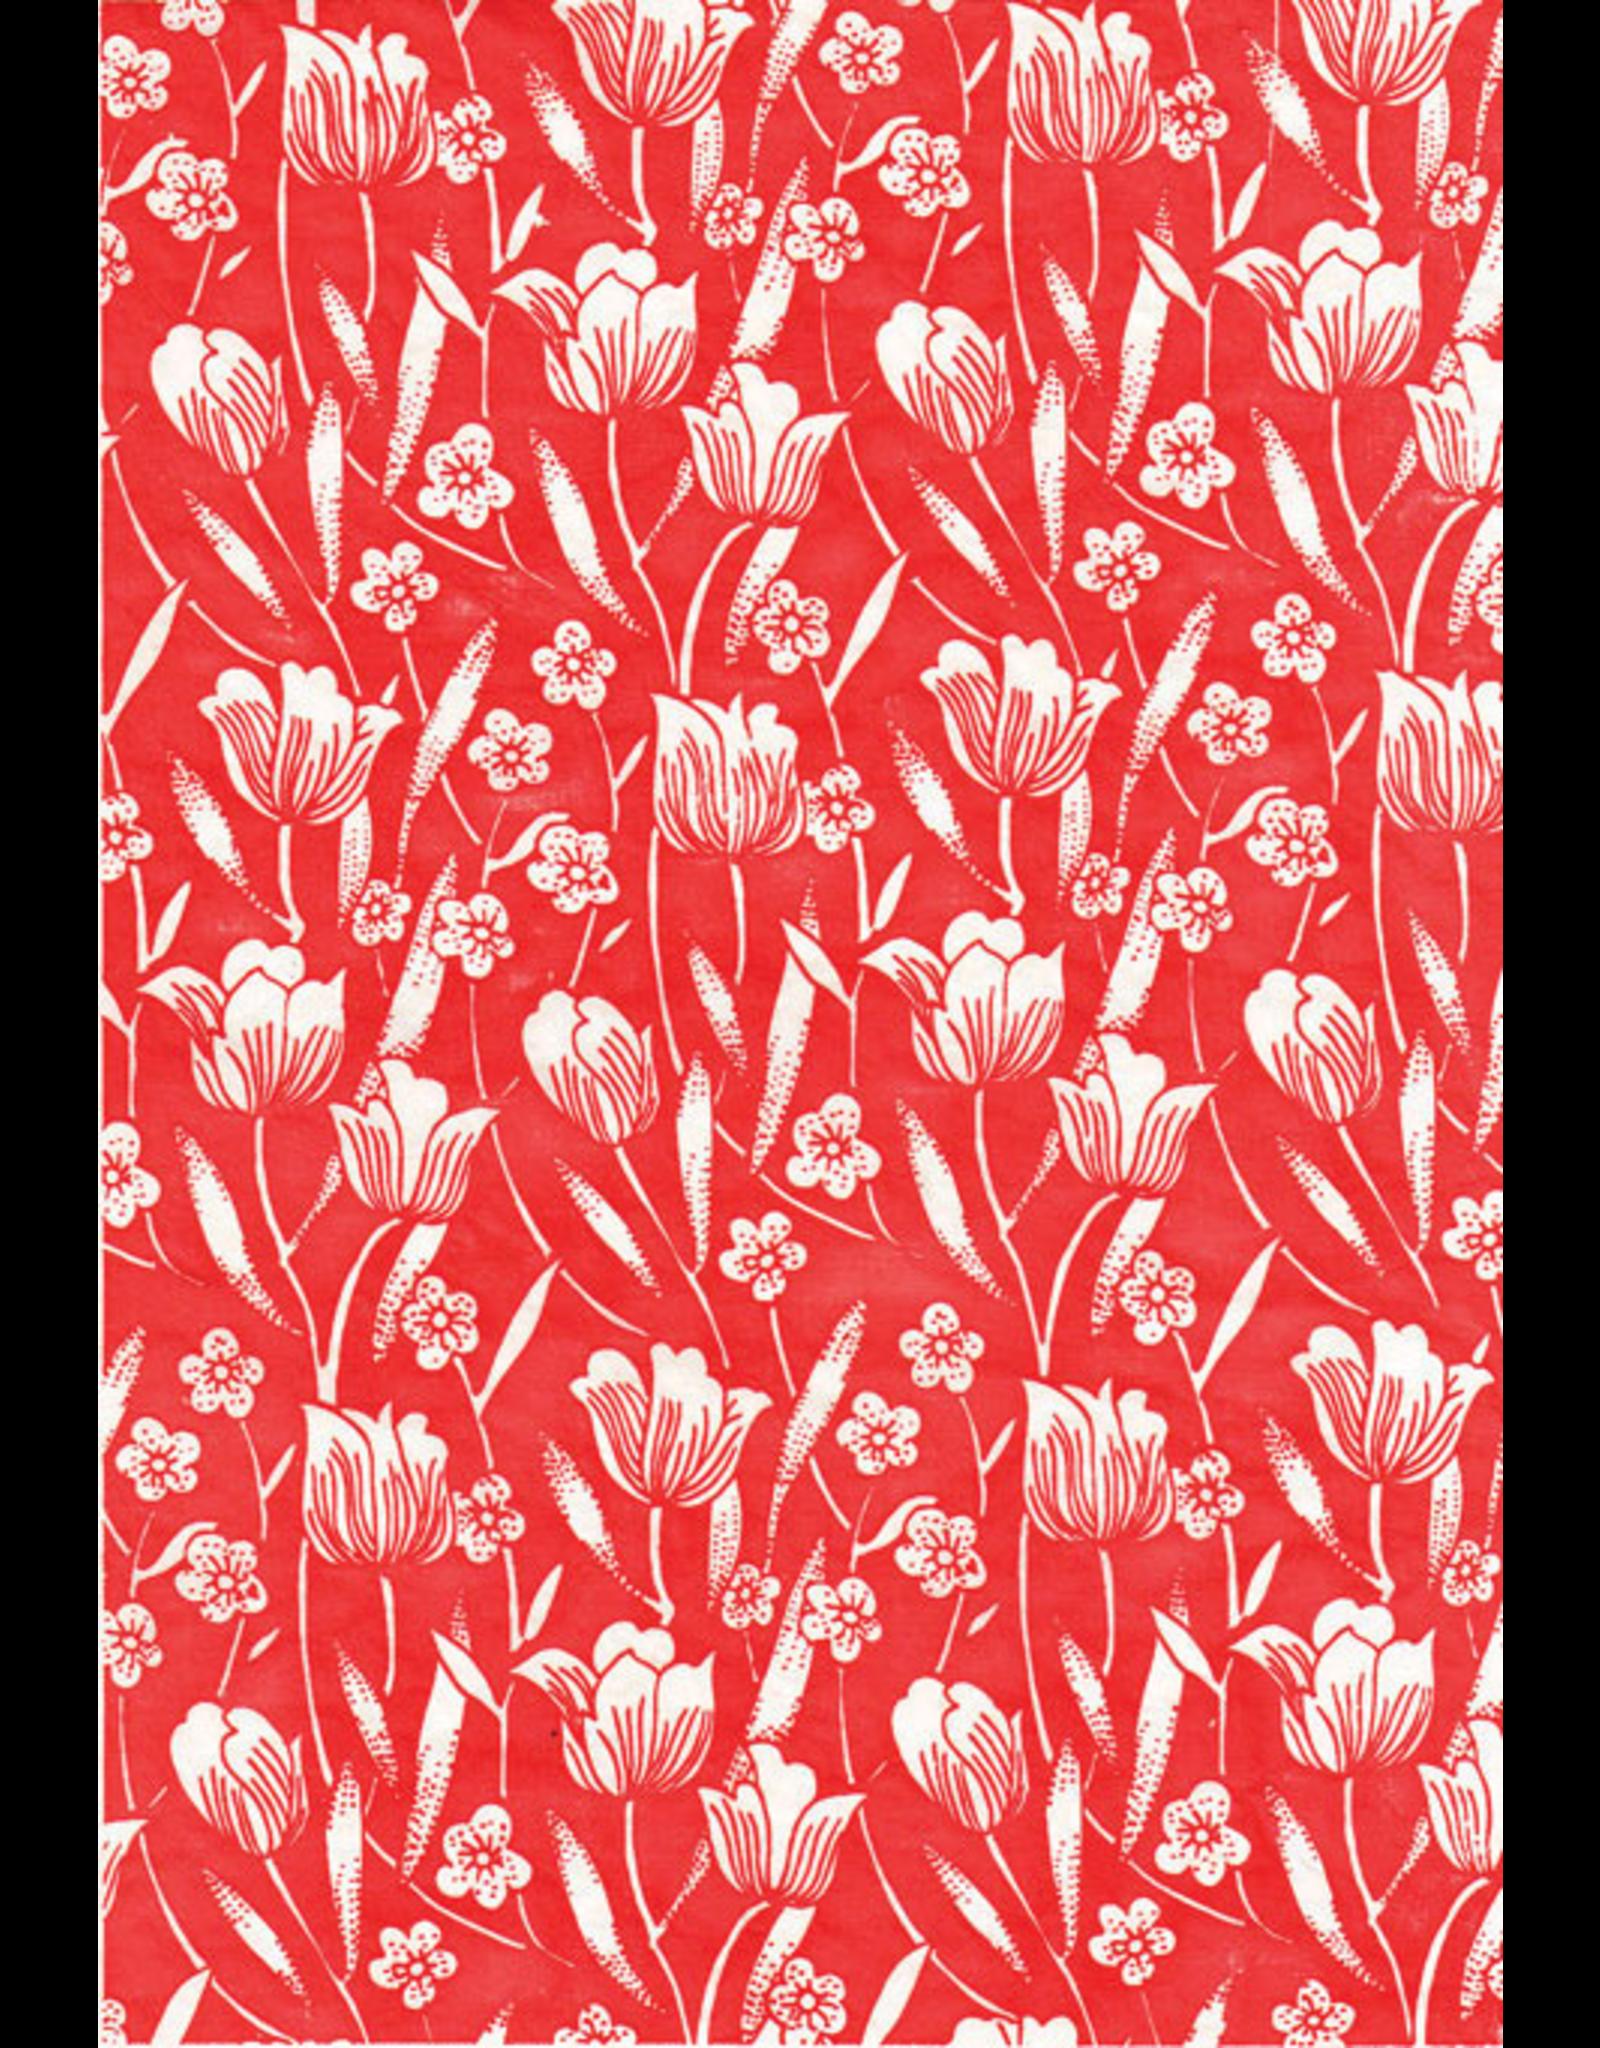 Sanbao Flower decal 08